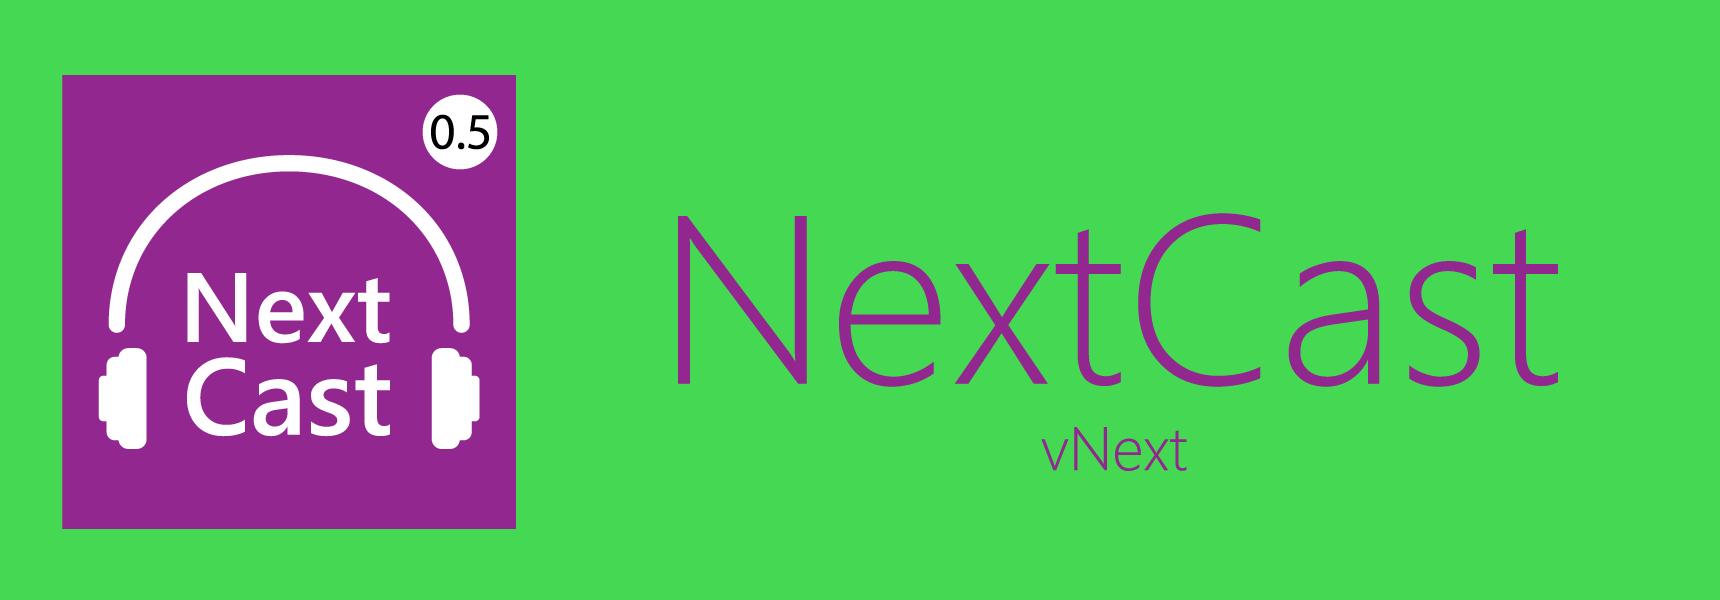 nextcast_05_g